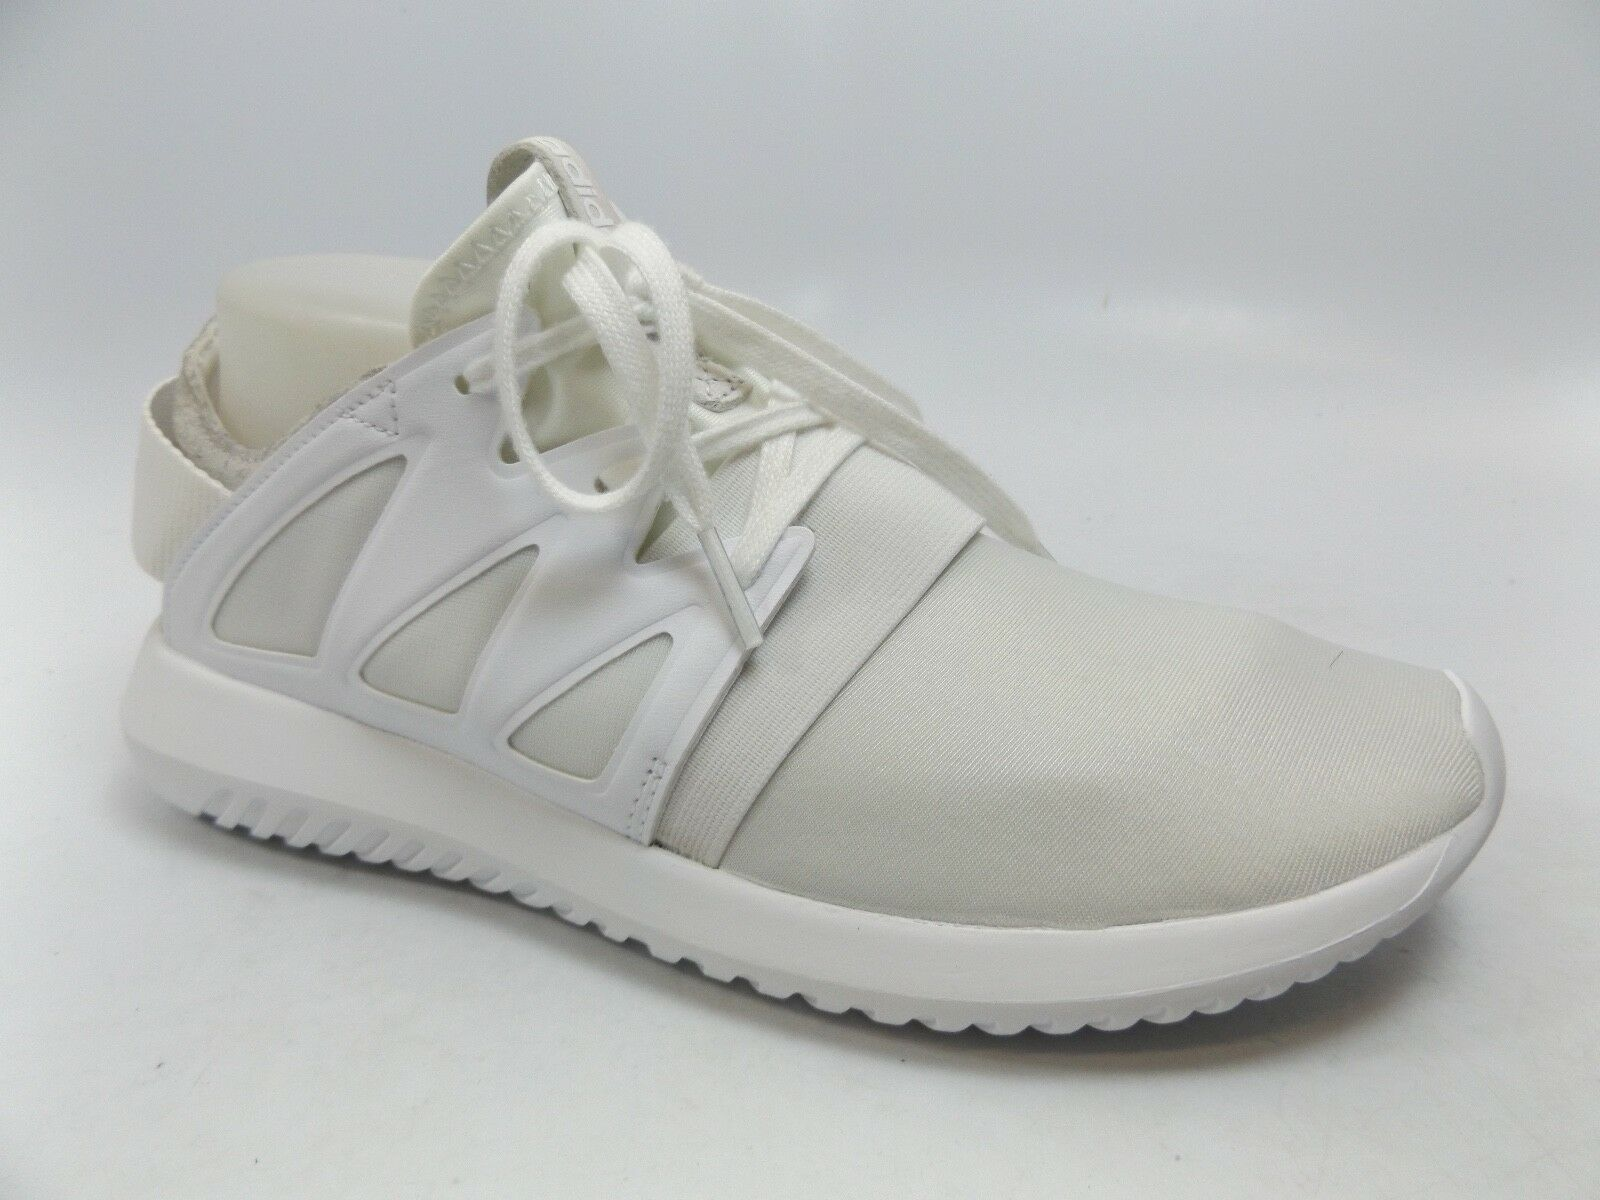 Adidas Adidas Adidas originali tubulare virale scarpe da donna gesso bianco sz 8,0 milioni d8346 | Affidabile Reputazione  | Gentiluomo/Signora Scarpa  750aa6